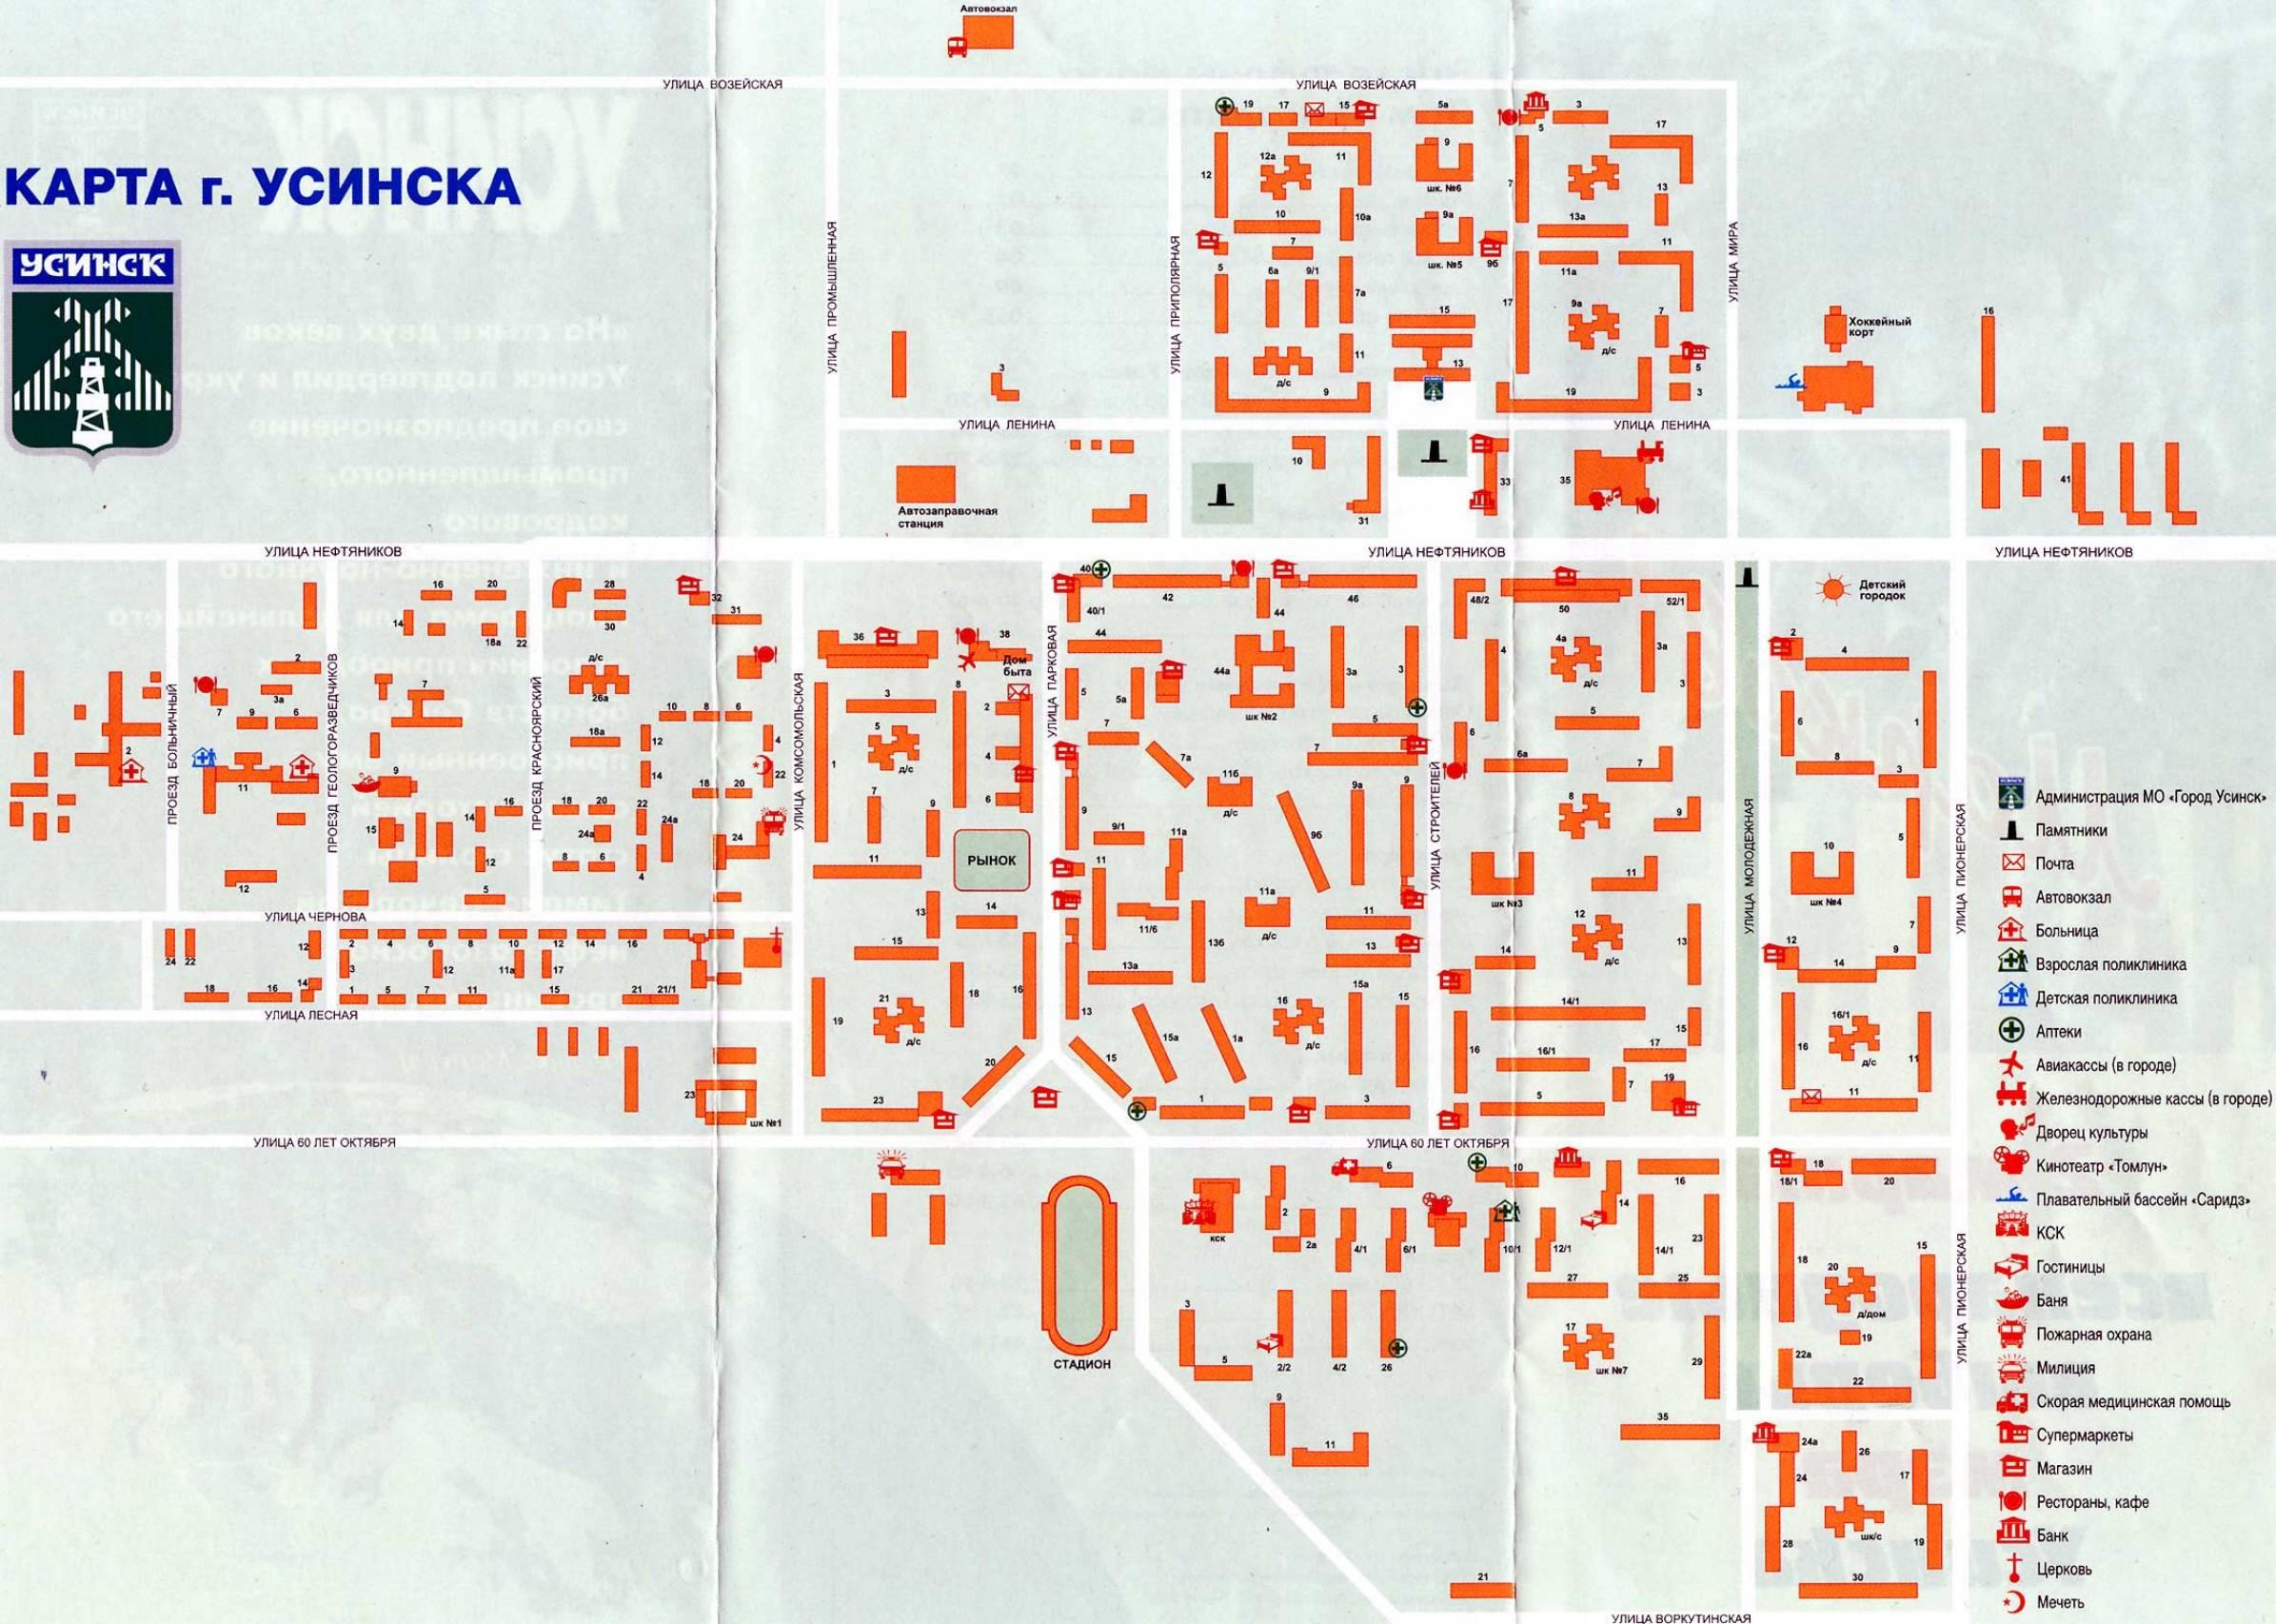 Карта Усинска С Улицами И Домами - mgdriver: http://mgdriver.weebly.com/blog/karta-usinska-s-ulitsami-i-domami